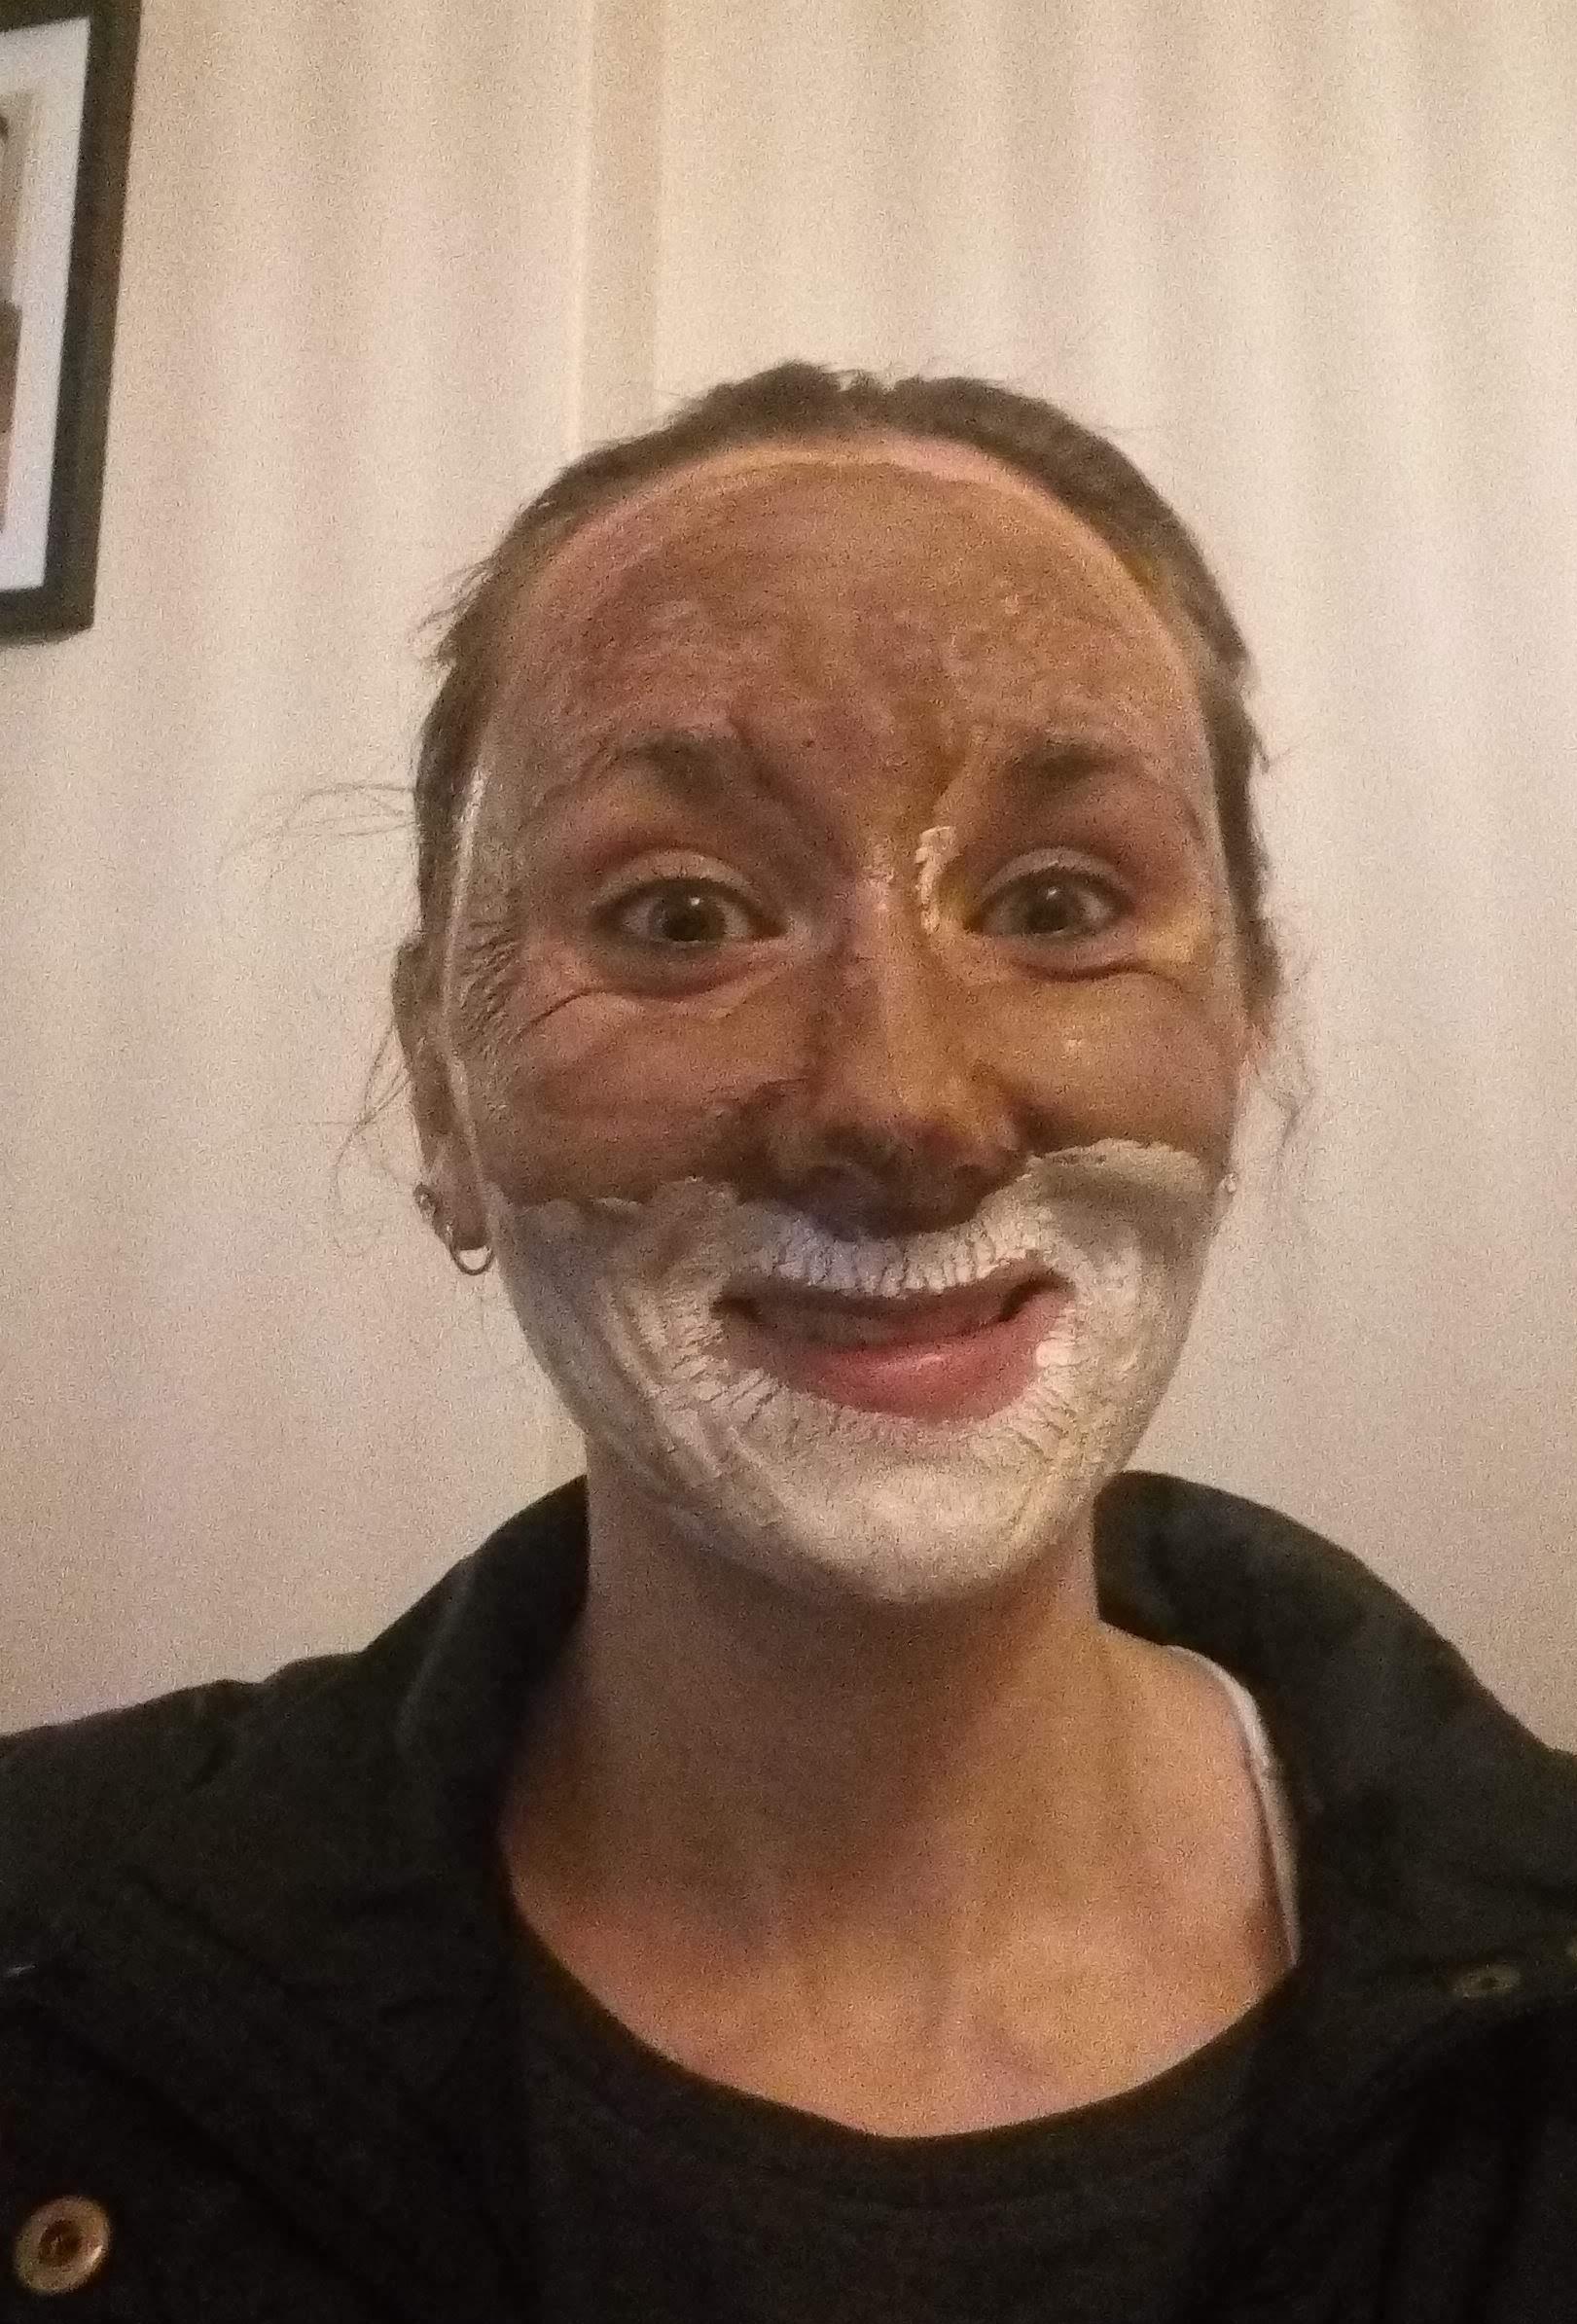 no moisturiser, moisturiser-free